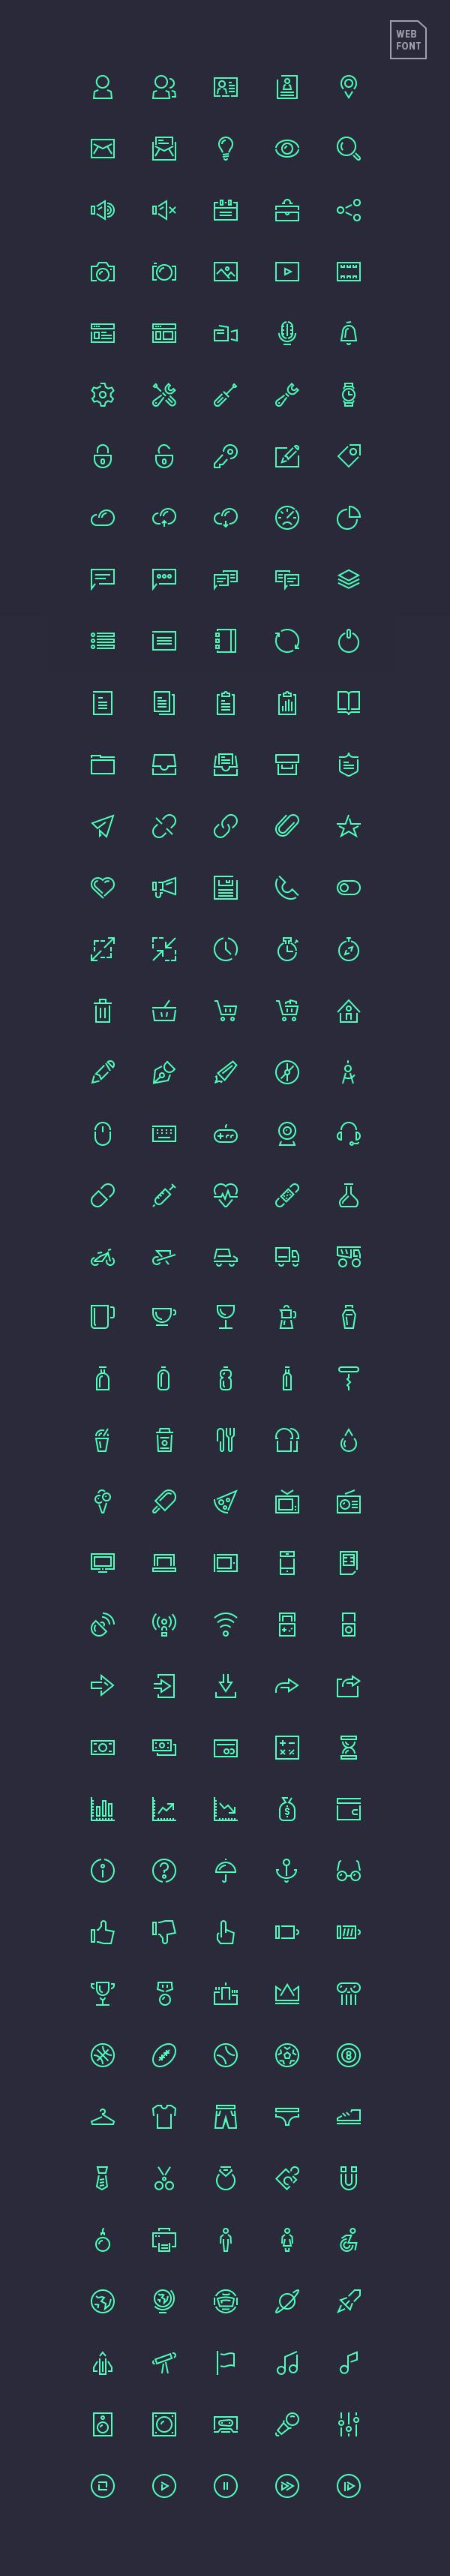 Icon-Stroke-Gap-Hadir-Sebagai-WebFont